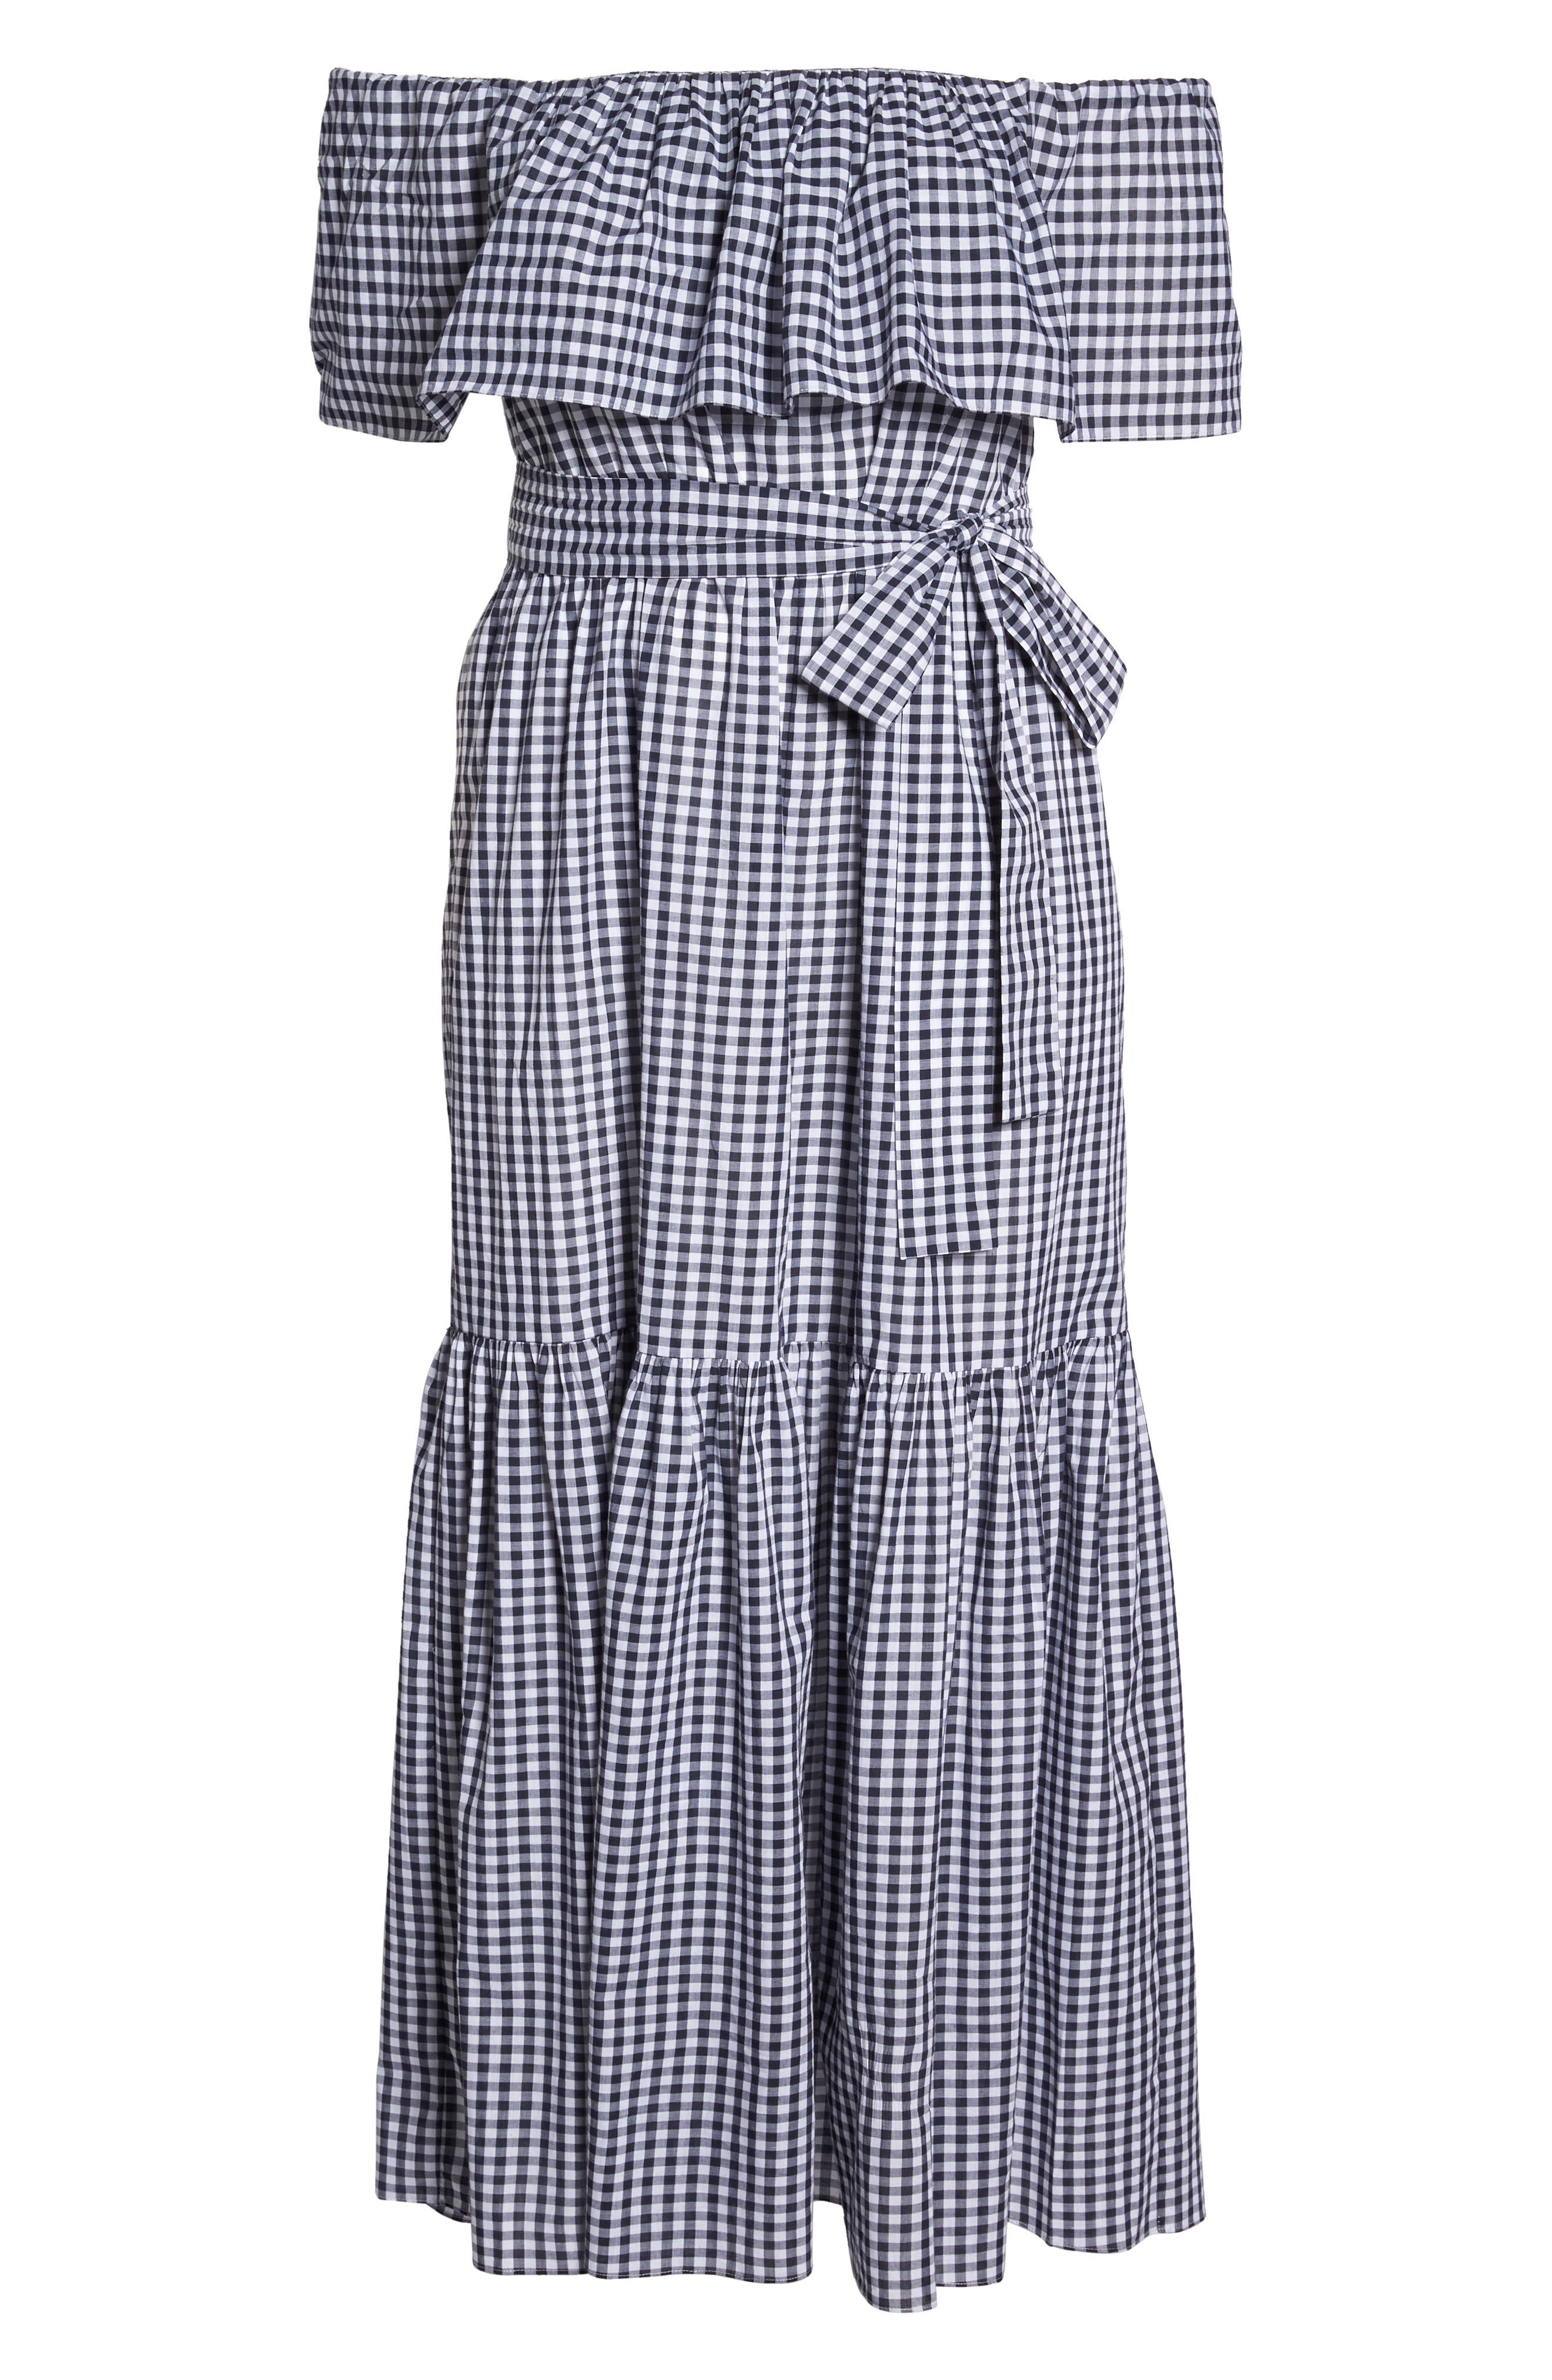 Off the Shoulder Gingham Maxi Dress,                             Alternate thumbnail 6, color,                             Blue White Gingham